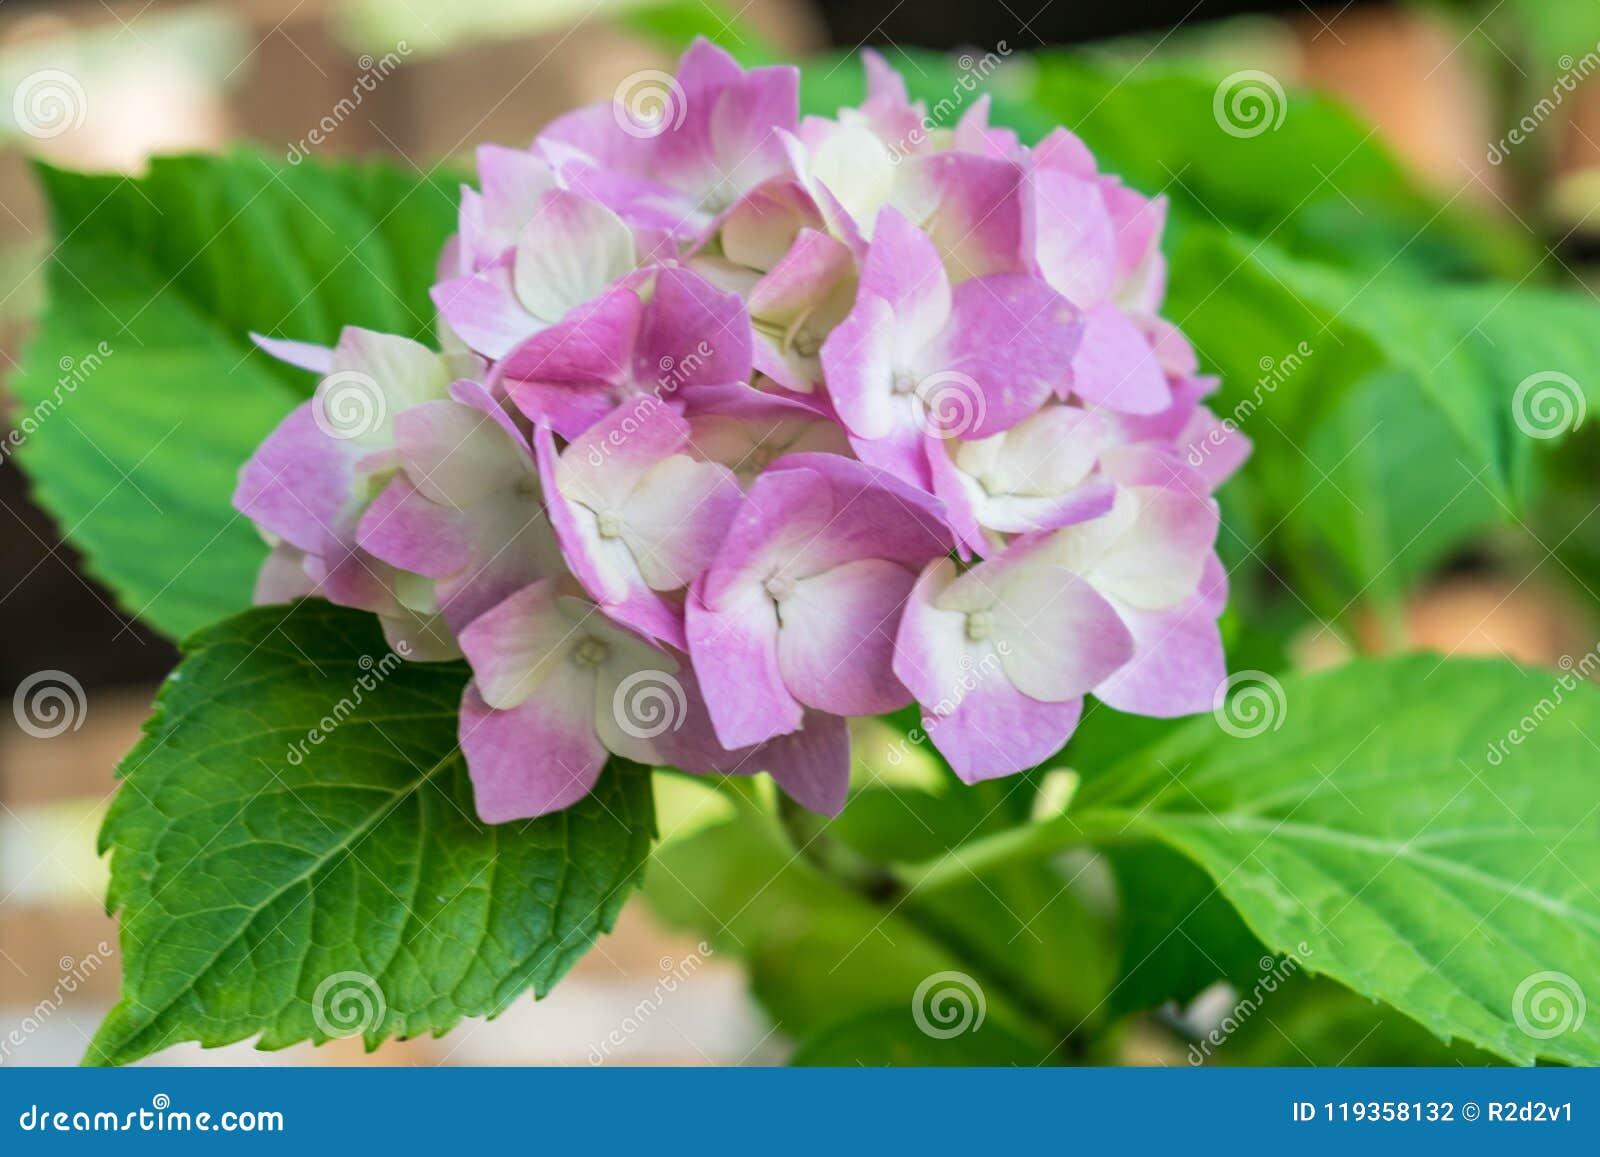 Pink Flower Hydrangea Serrata Stock Photo Image Of Leaves Heaven